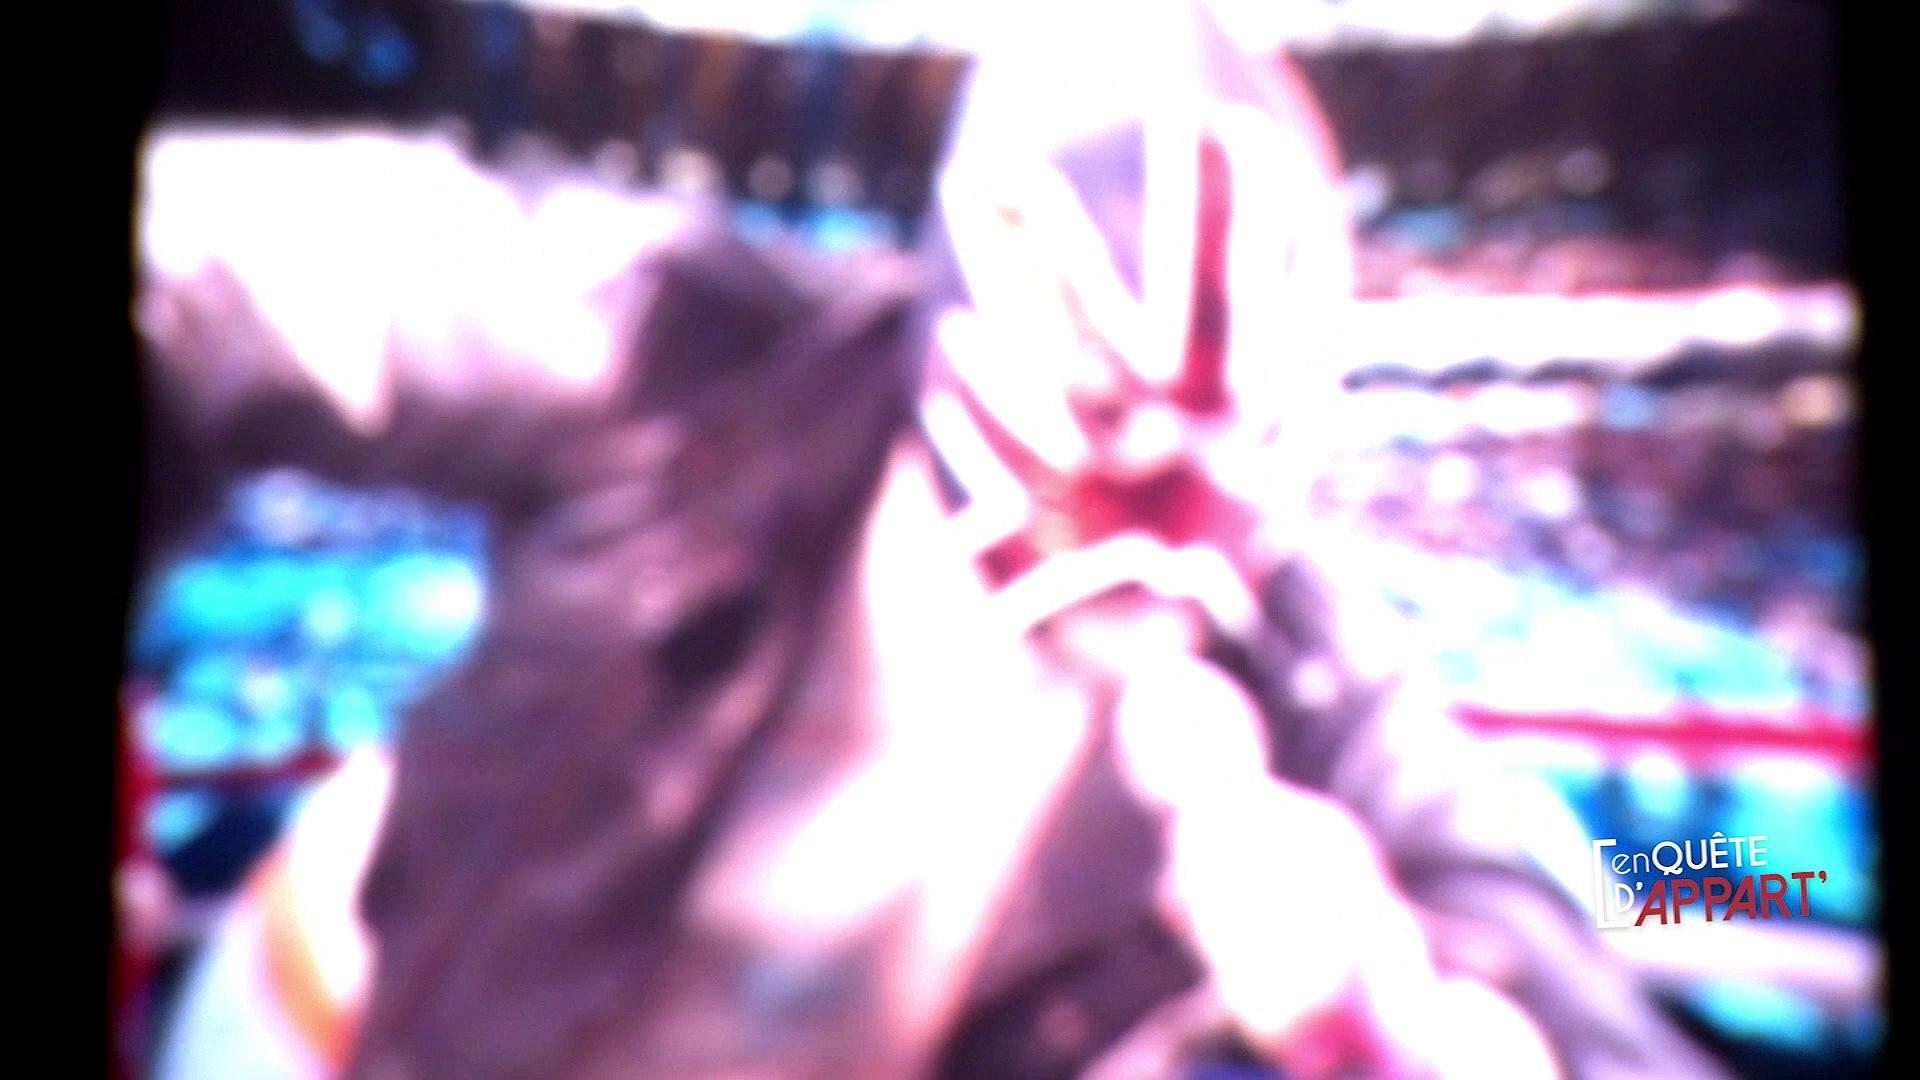 Shirley sur le ring - Défi de Shirley #6